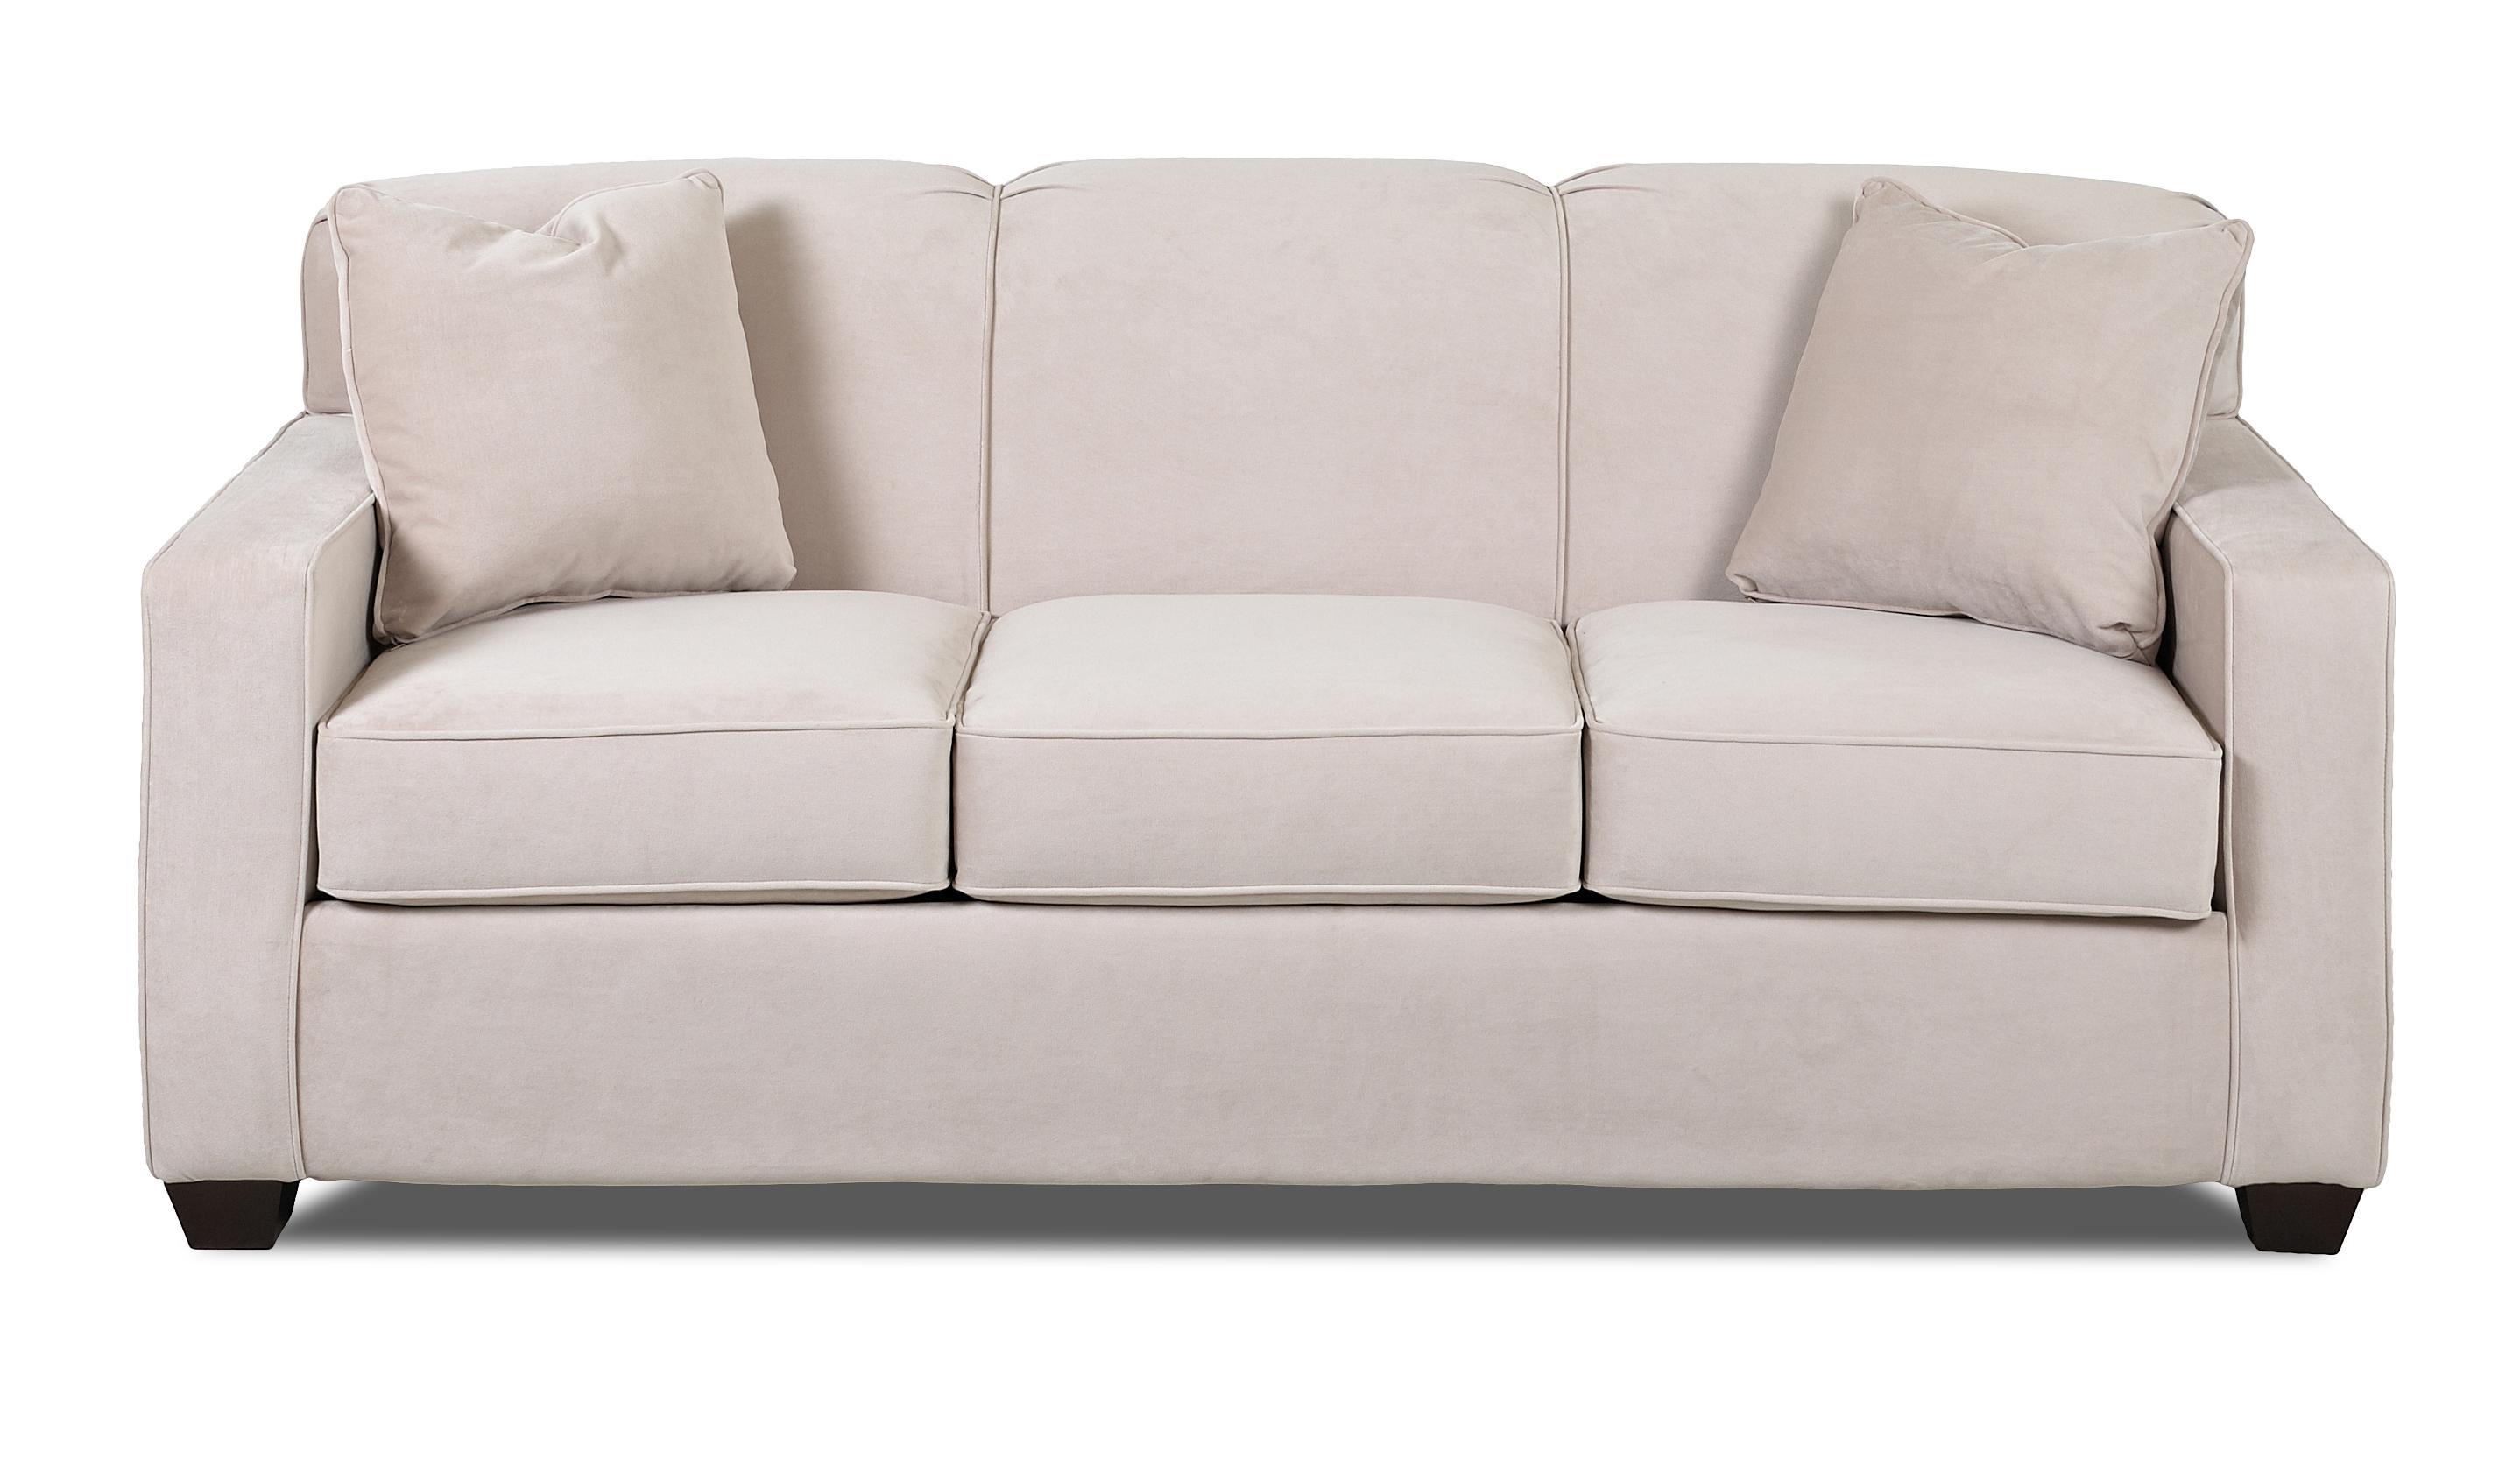 klaussner gillis contemporary enso queen sleeper sofa with tight rh valuecitynj com Queen Sleeper Sofas On Sale Queen Sleeper Sofas On Sale